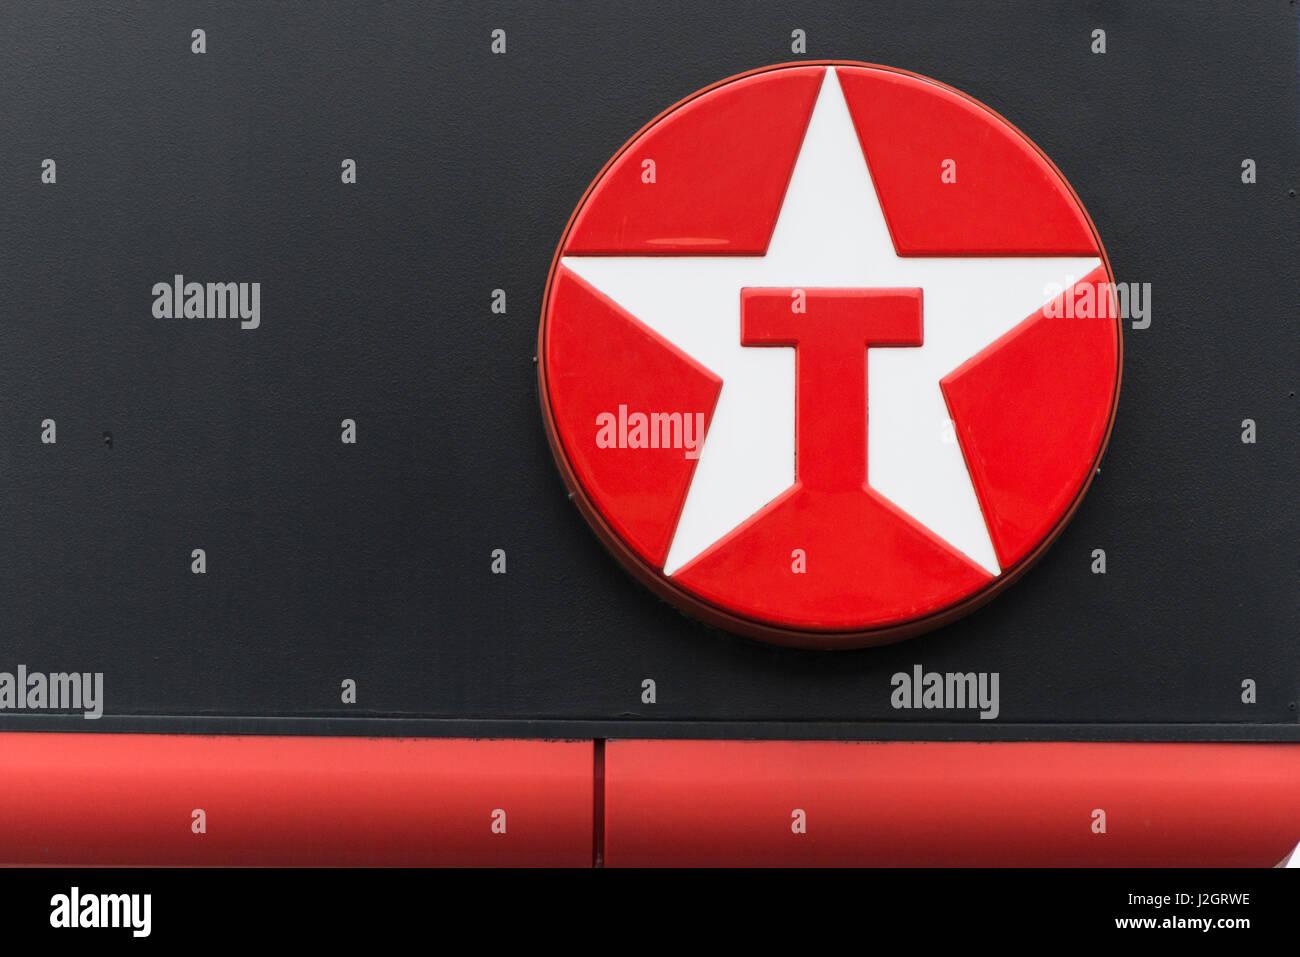 texaco logo stockfotos amp texaco logo bilder alamy